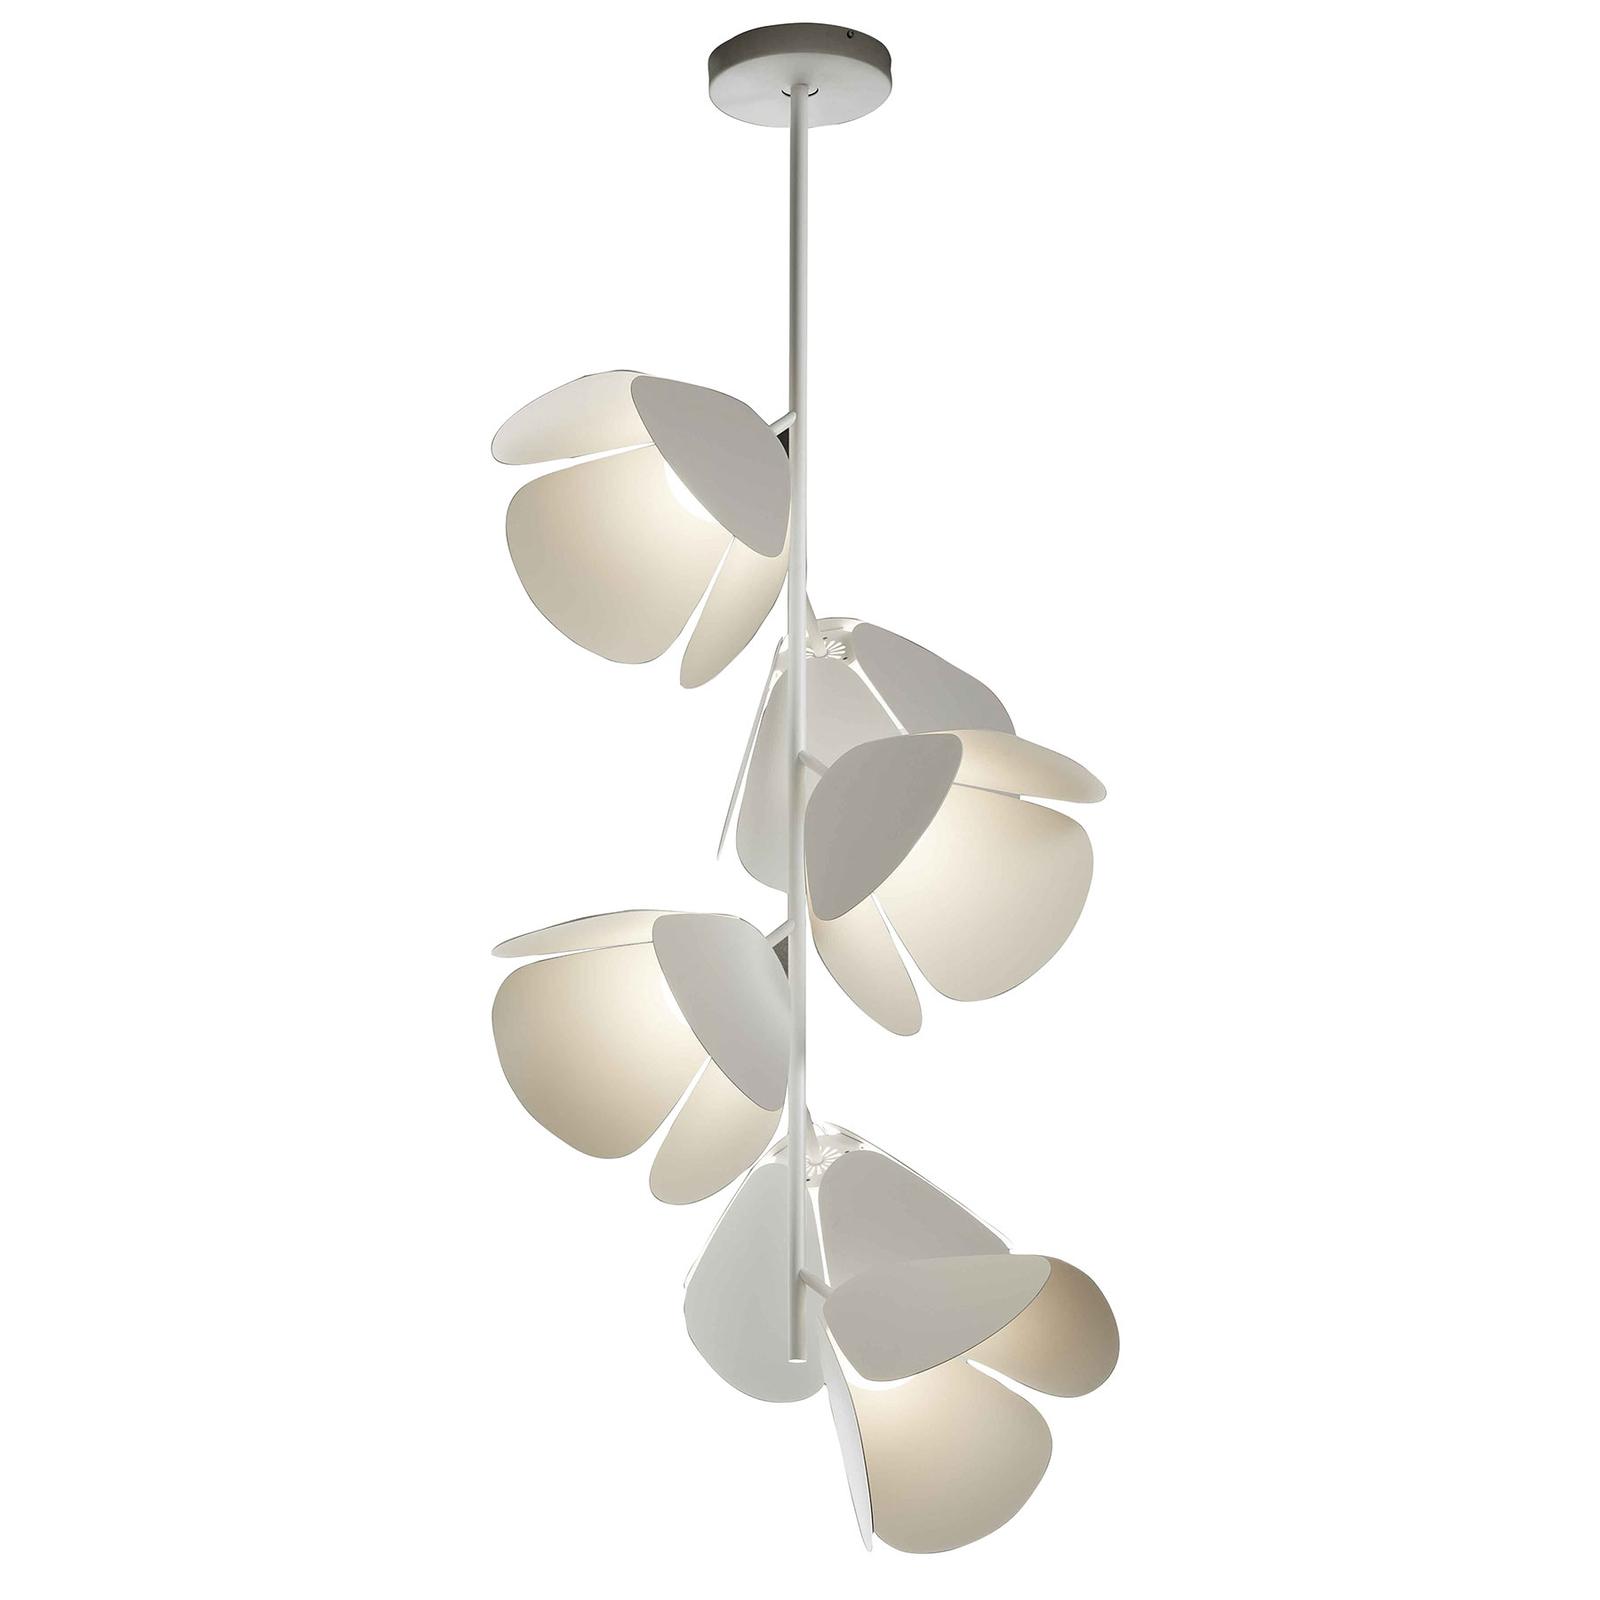 Bover Mod PF/73/6L LED plafondlamp, wit